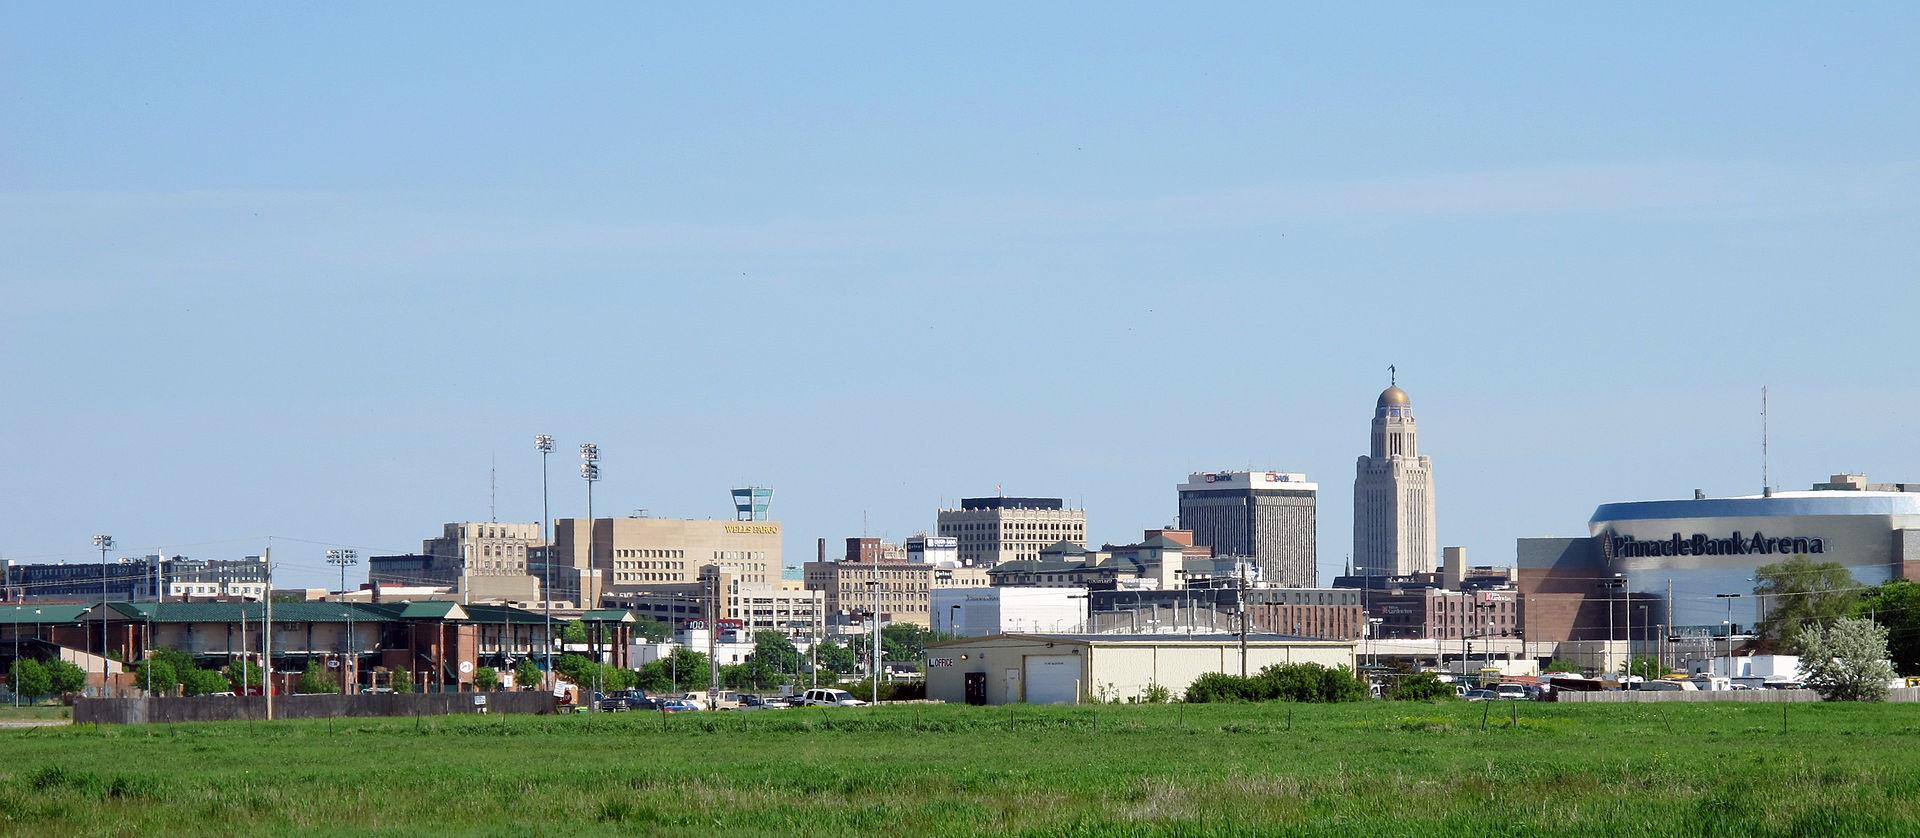 Skyline_of_Downtown_Lincoln,_Nebraska,_USA_(2015)